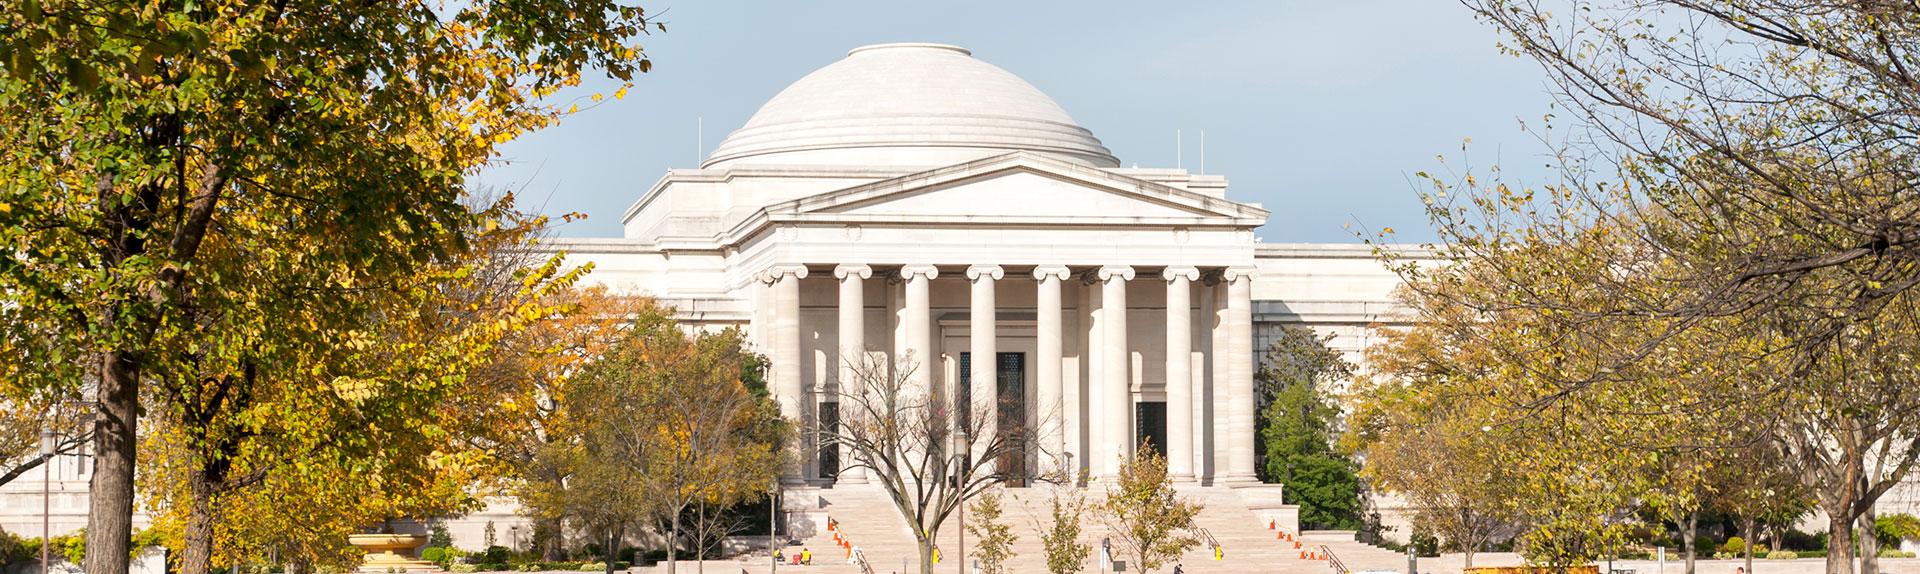 National Gallery of Art at Melrose Georgetown, Washington